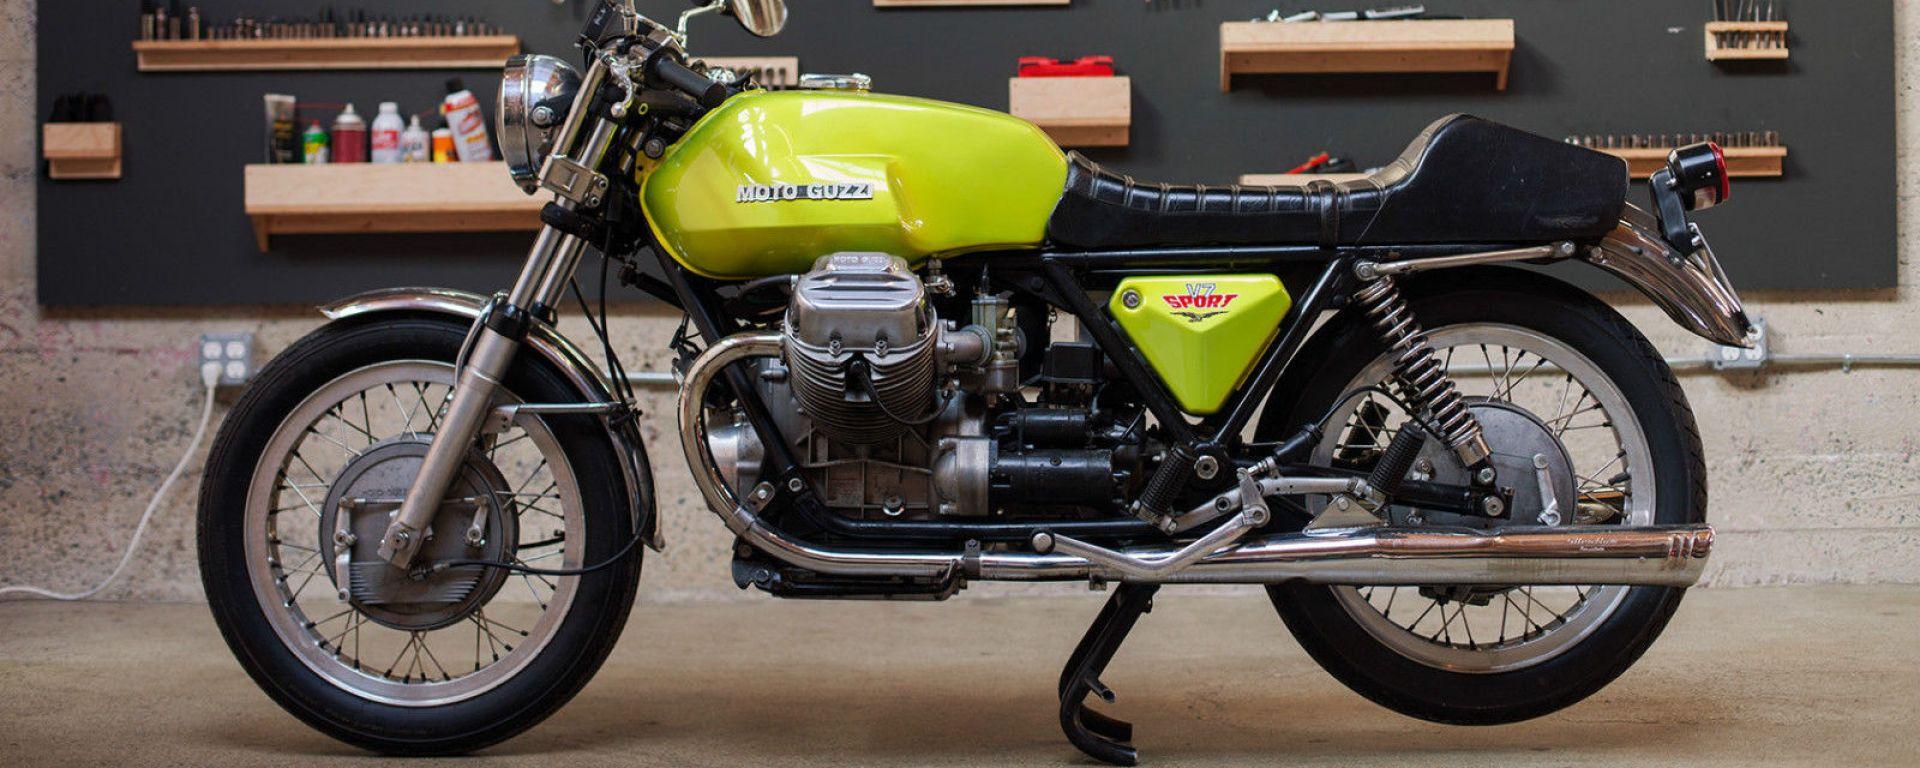 Moto Guzzi compie 100 anni: ecco l'asta speciale di Catawiki